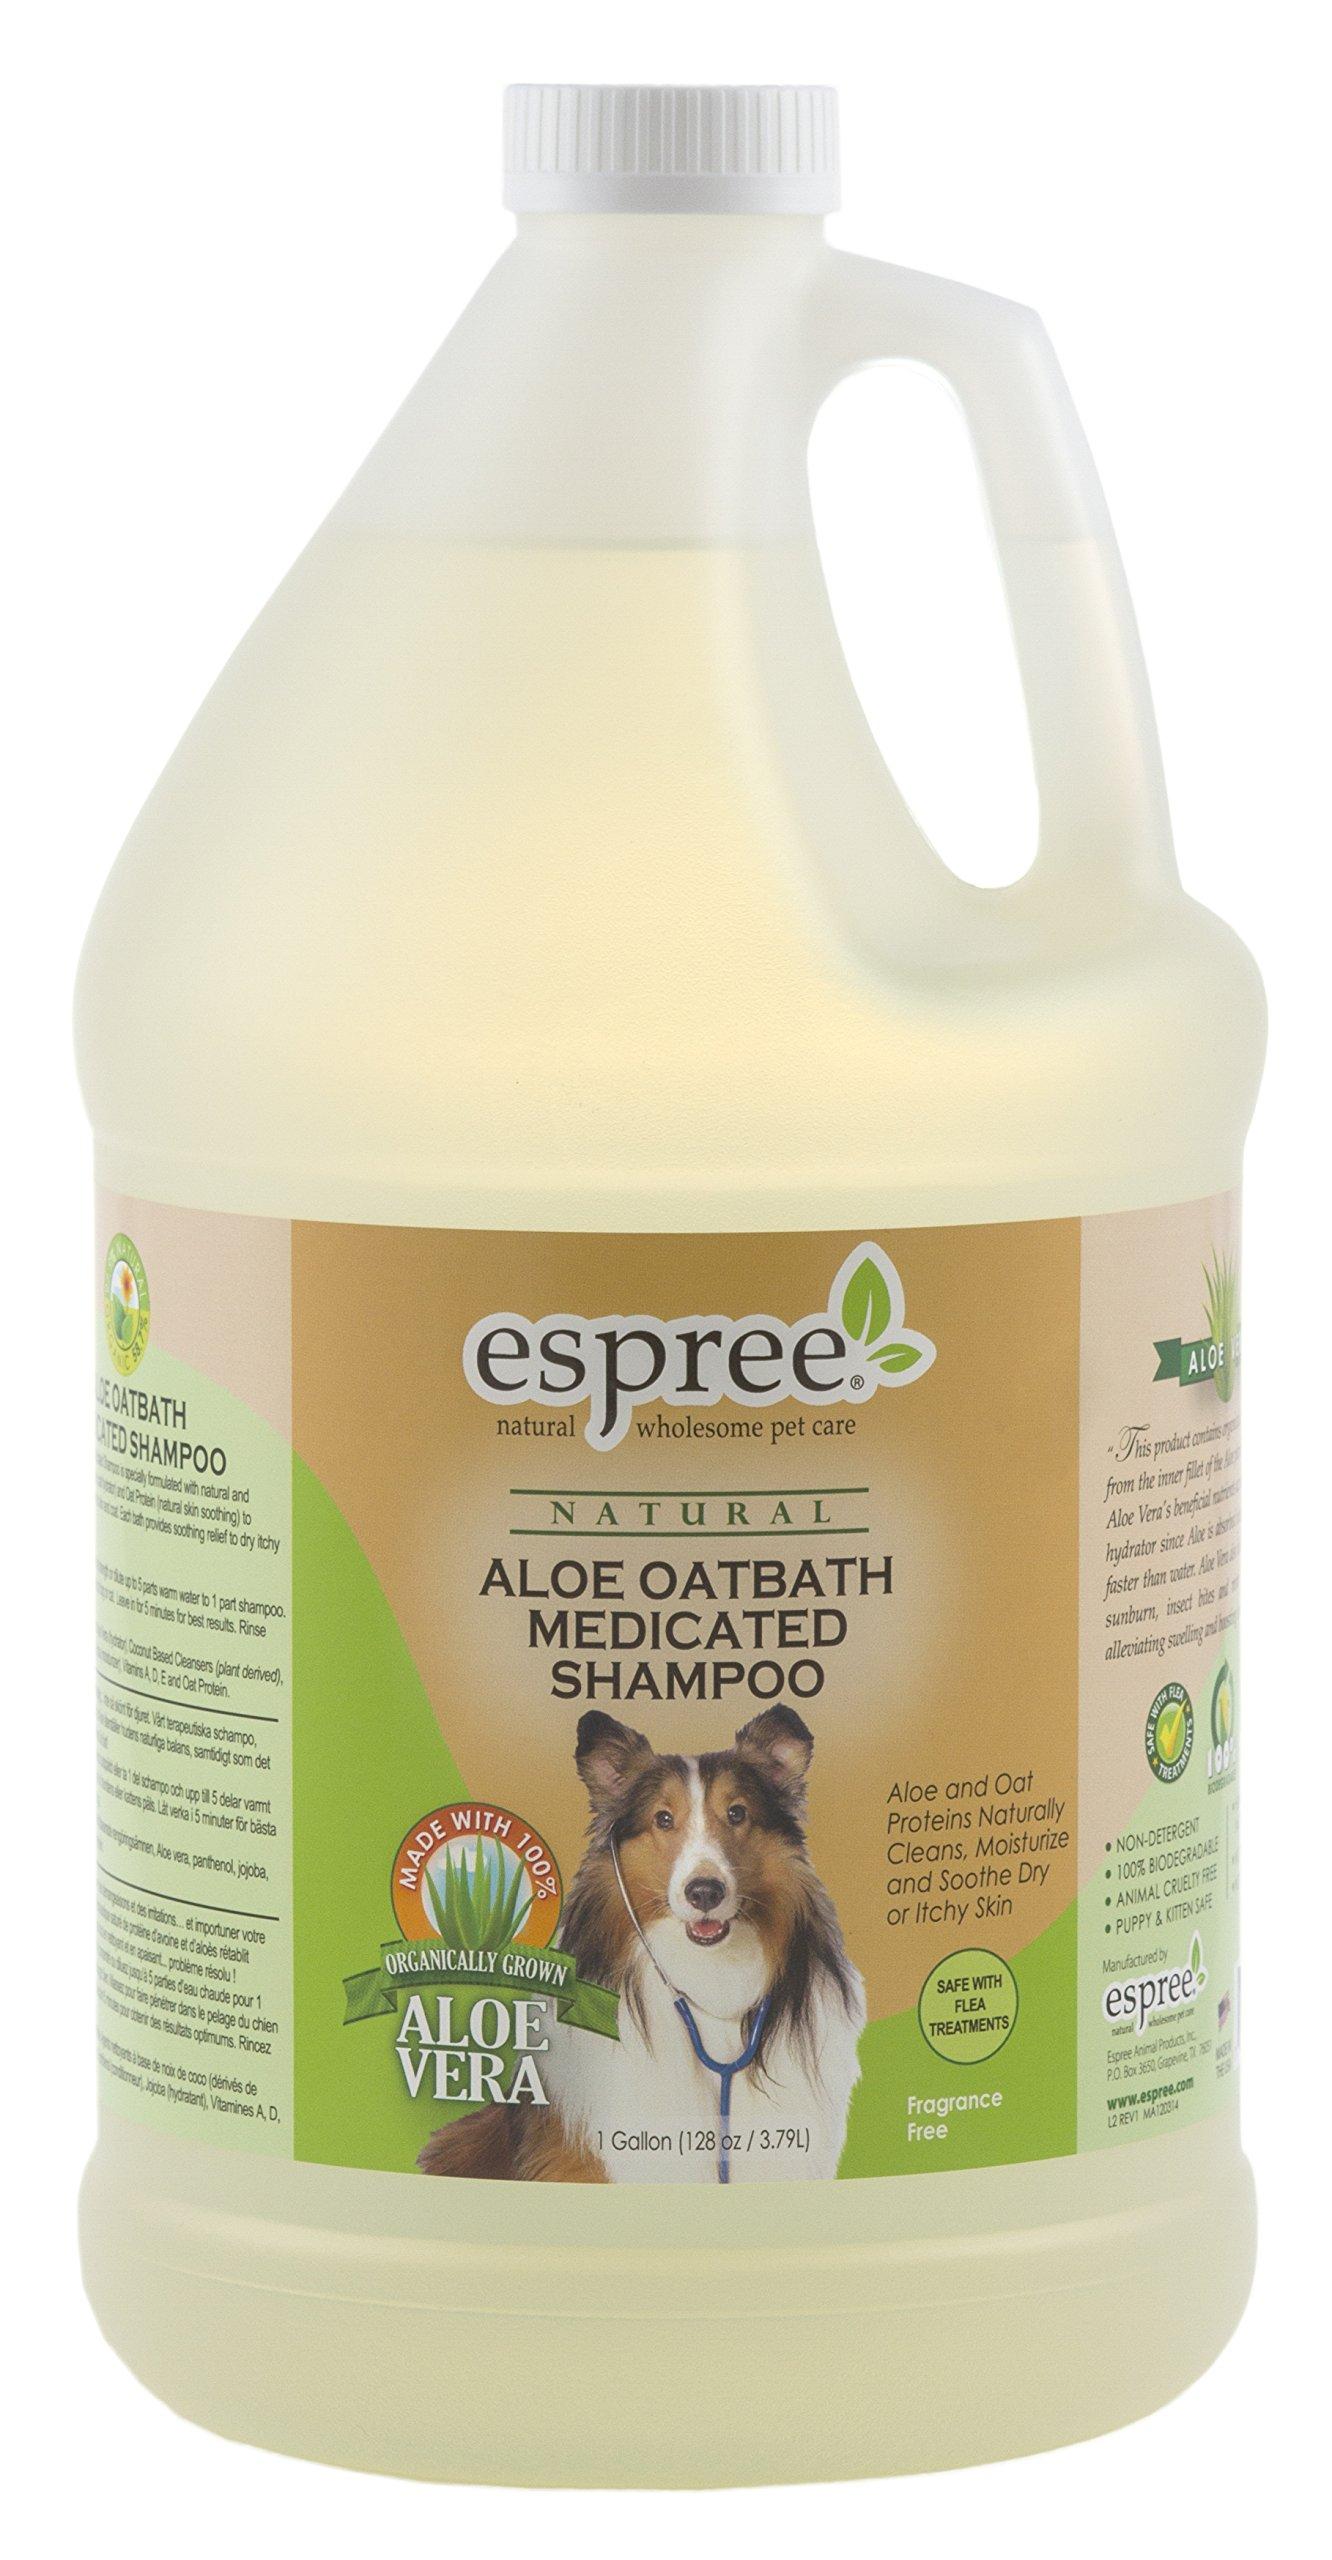 Espree Aloe Oatbath Medicated Shampoo, 1 Gallon by Espree